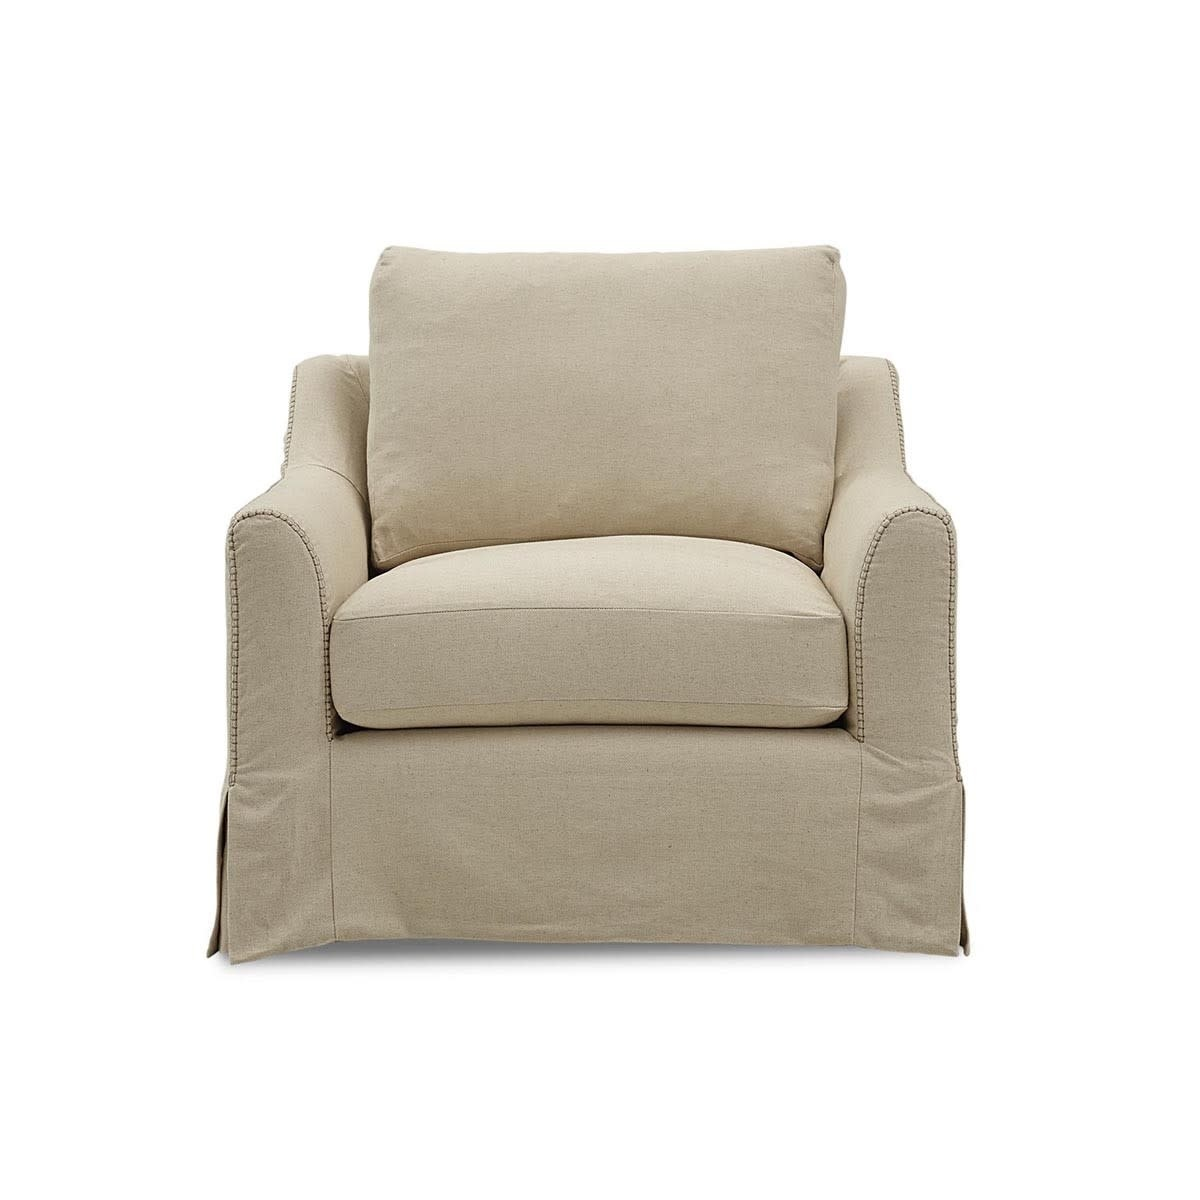 Kensington Chair Beige